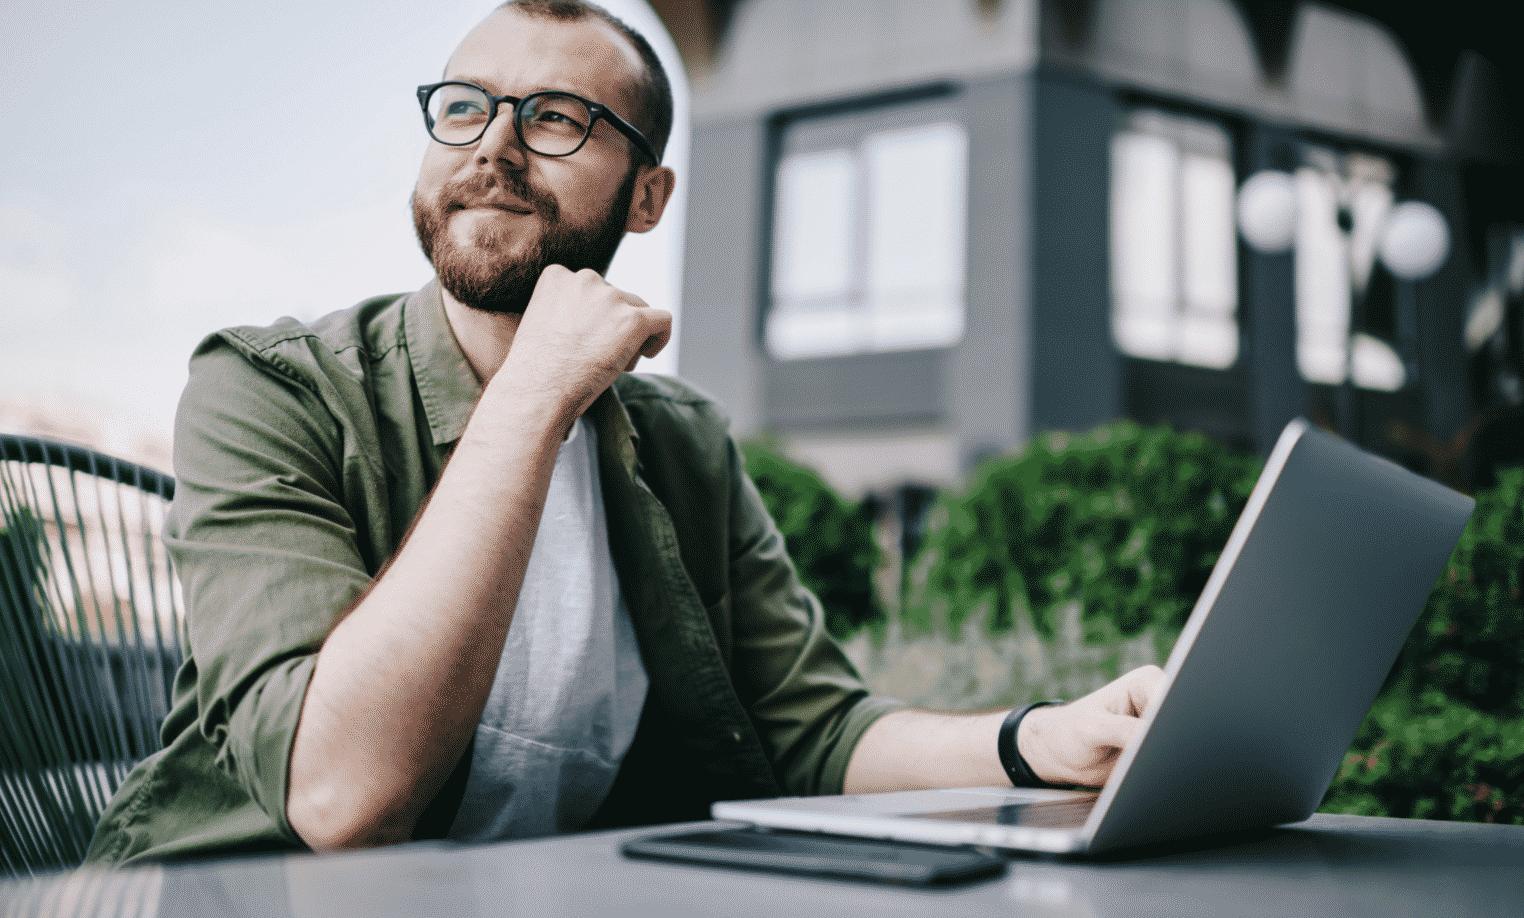 Freelance News, Freelancing Resources, Freelancing Skills, Freelancing Tips, Freelancing Platforms, Tips for Freelancers